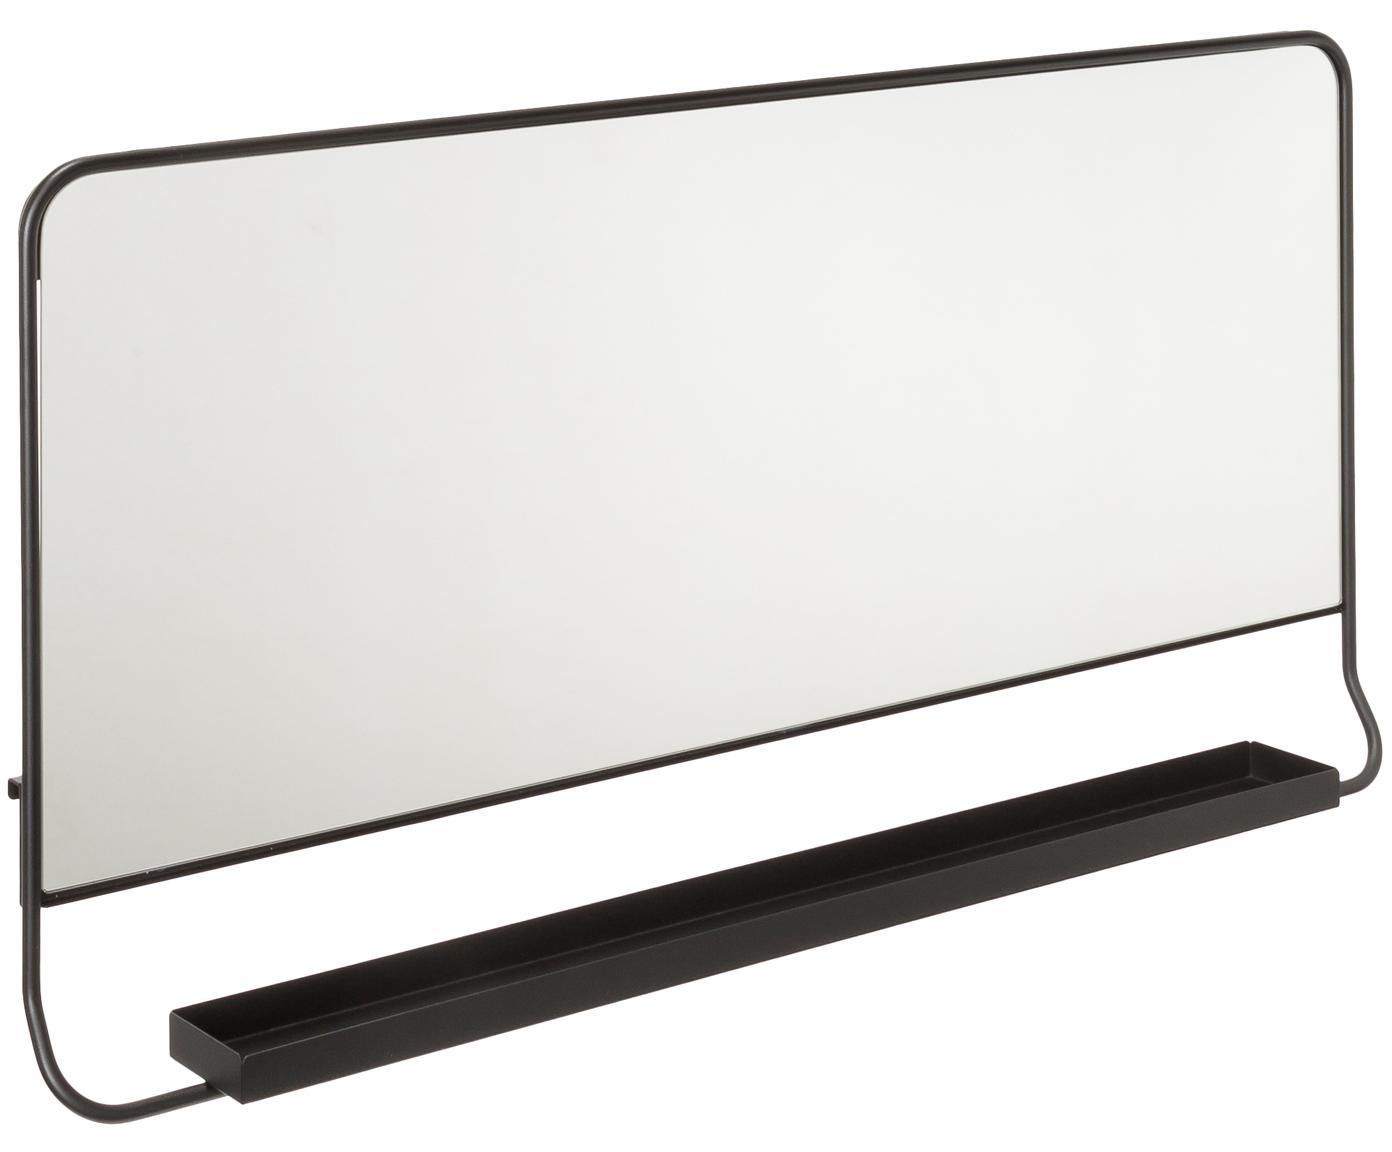 Espejo de pared rectangular Chic, con estante, Negro, An 80 x Al 40 cm